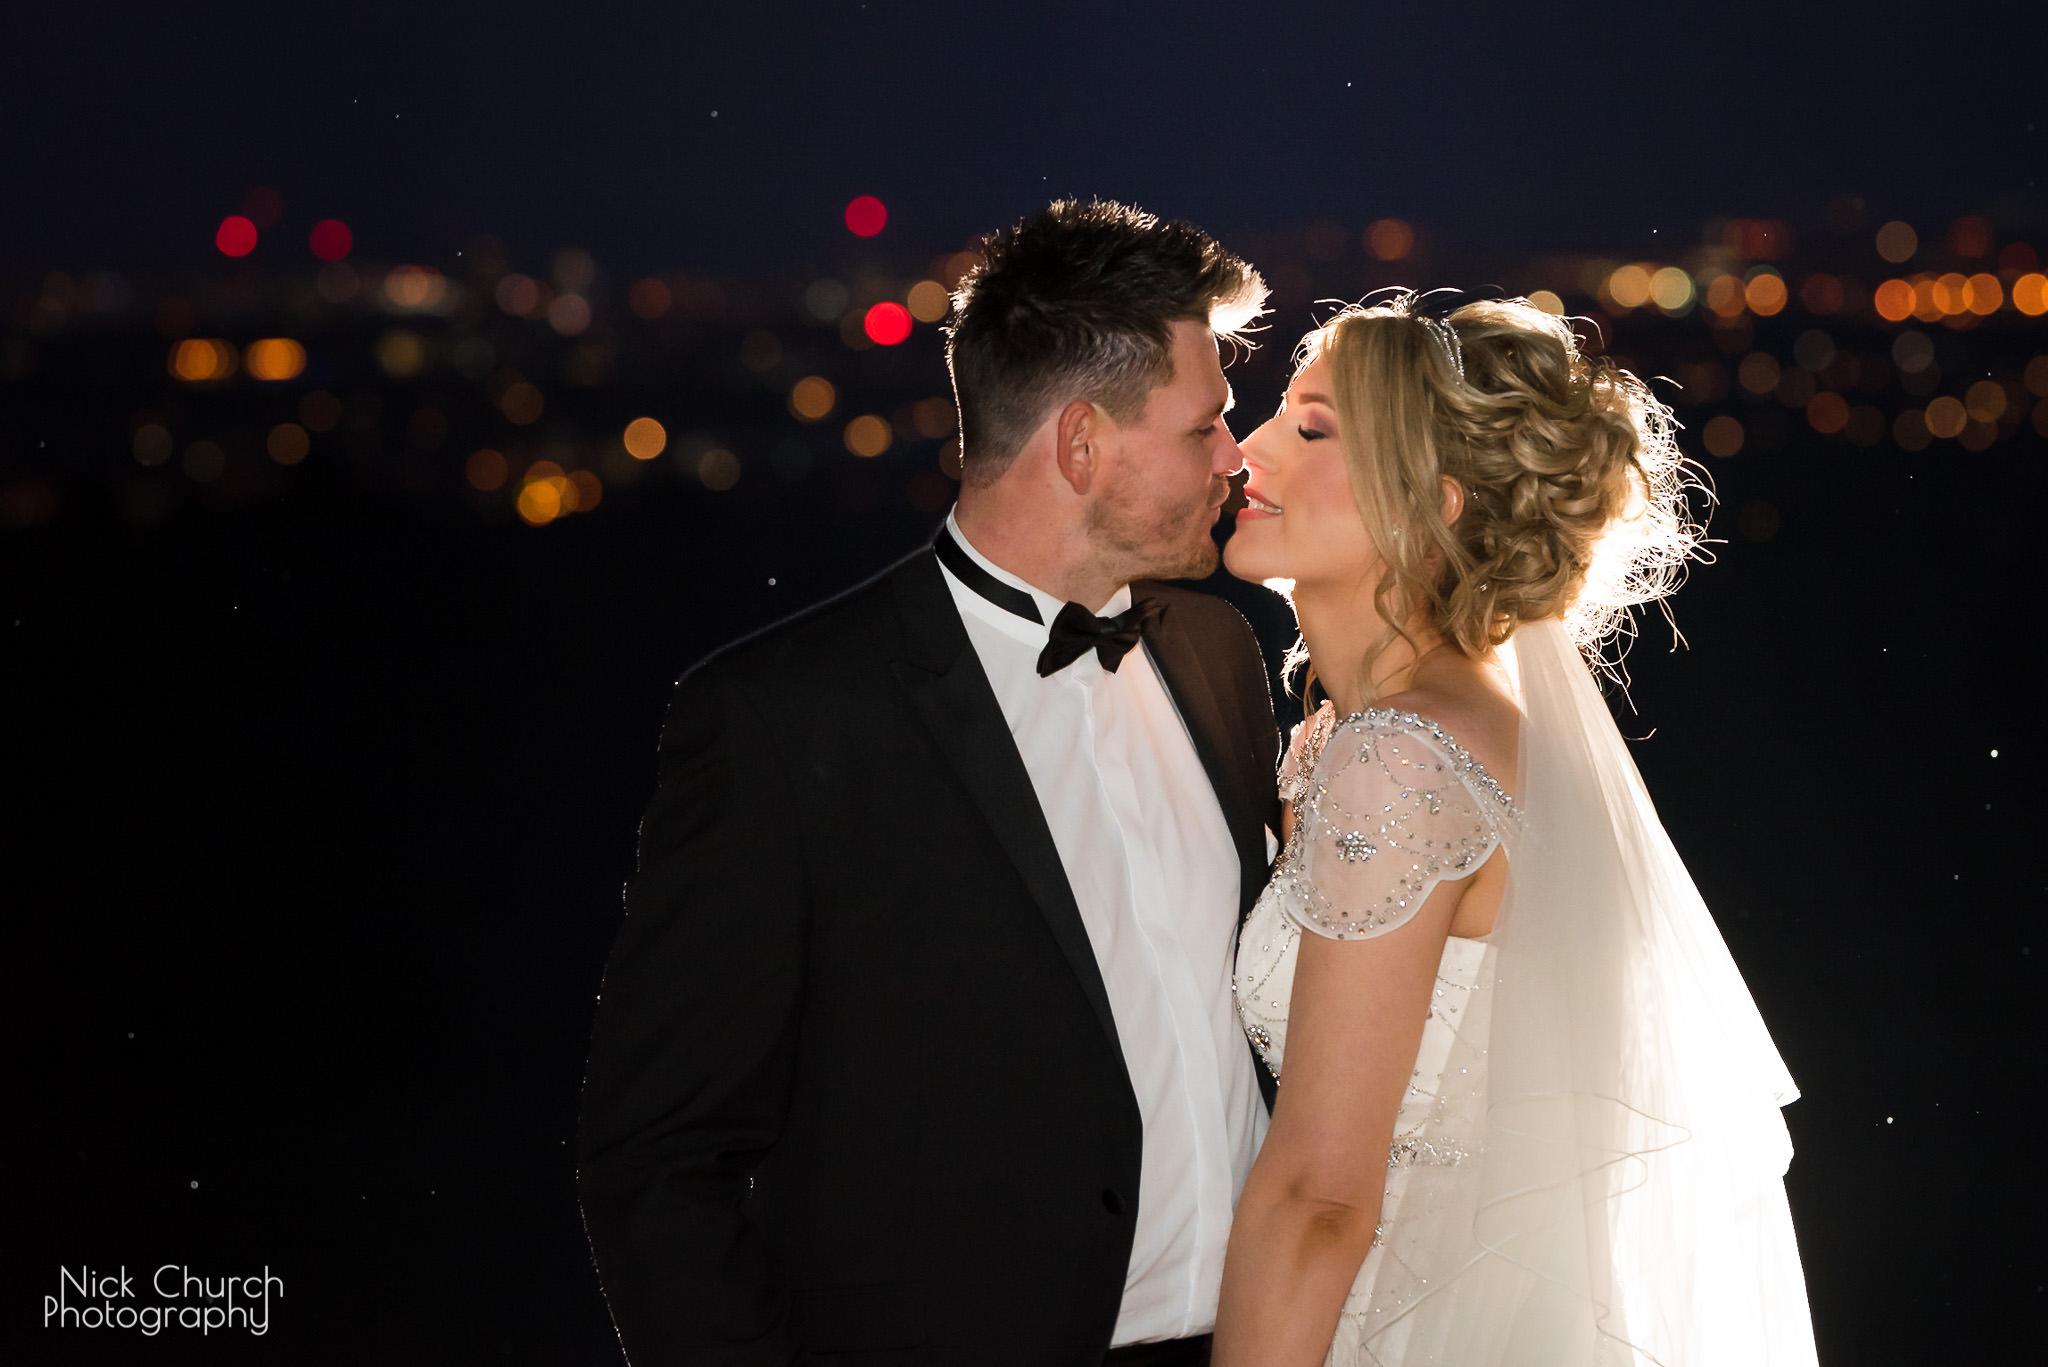 NC-20180317-stacy-and-mike-wedding-2089.jpg